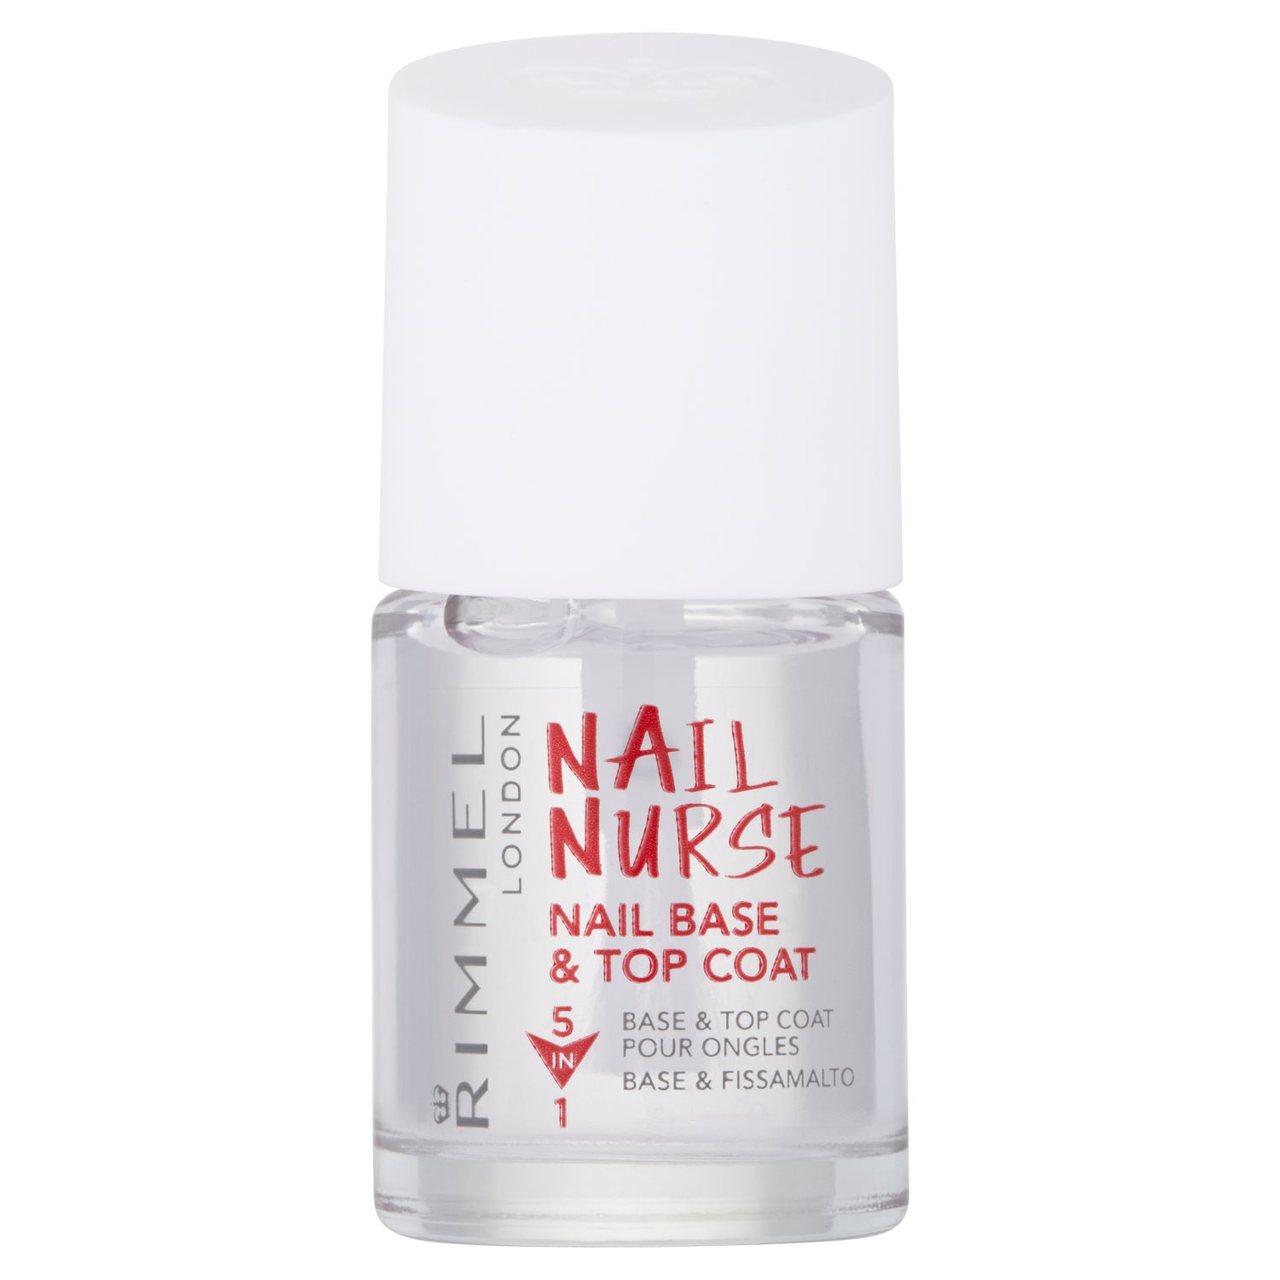 An image of Rimmel Nail Nurse 5 in 1 Base & Top Coat